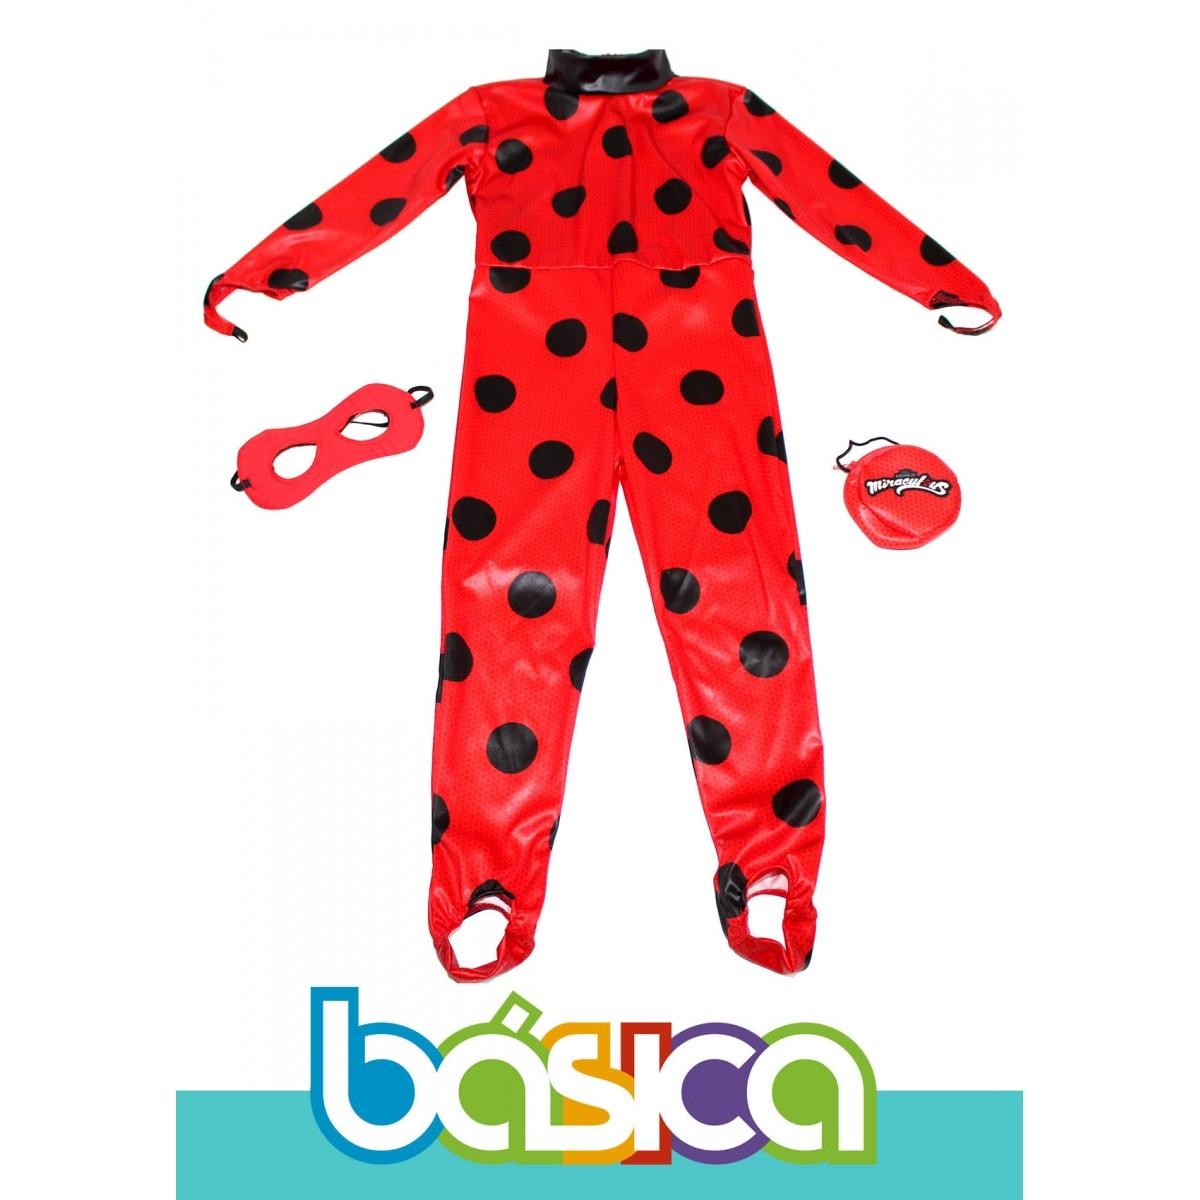 Fantasia da LadyBug Infantil  - BÁSICA UNIFORMES